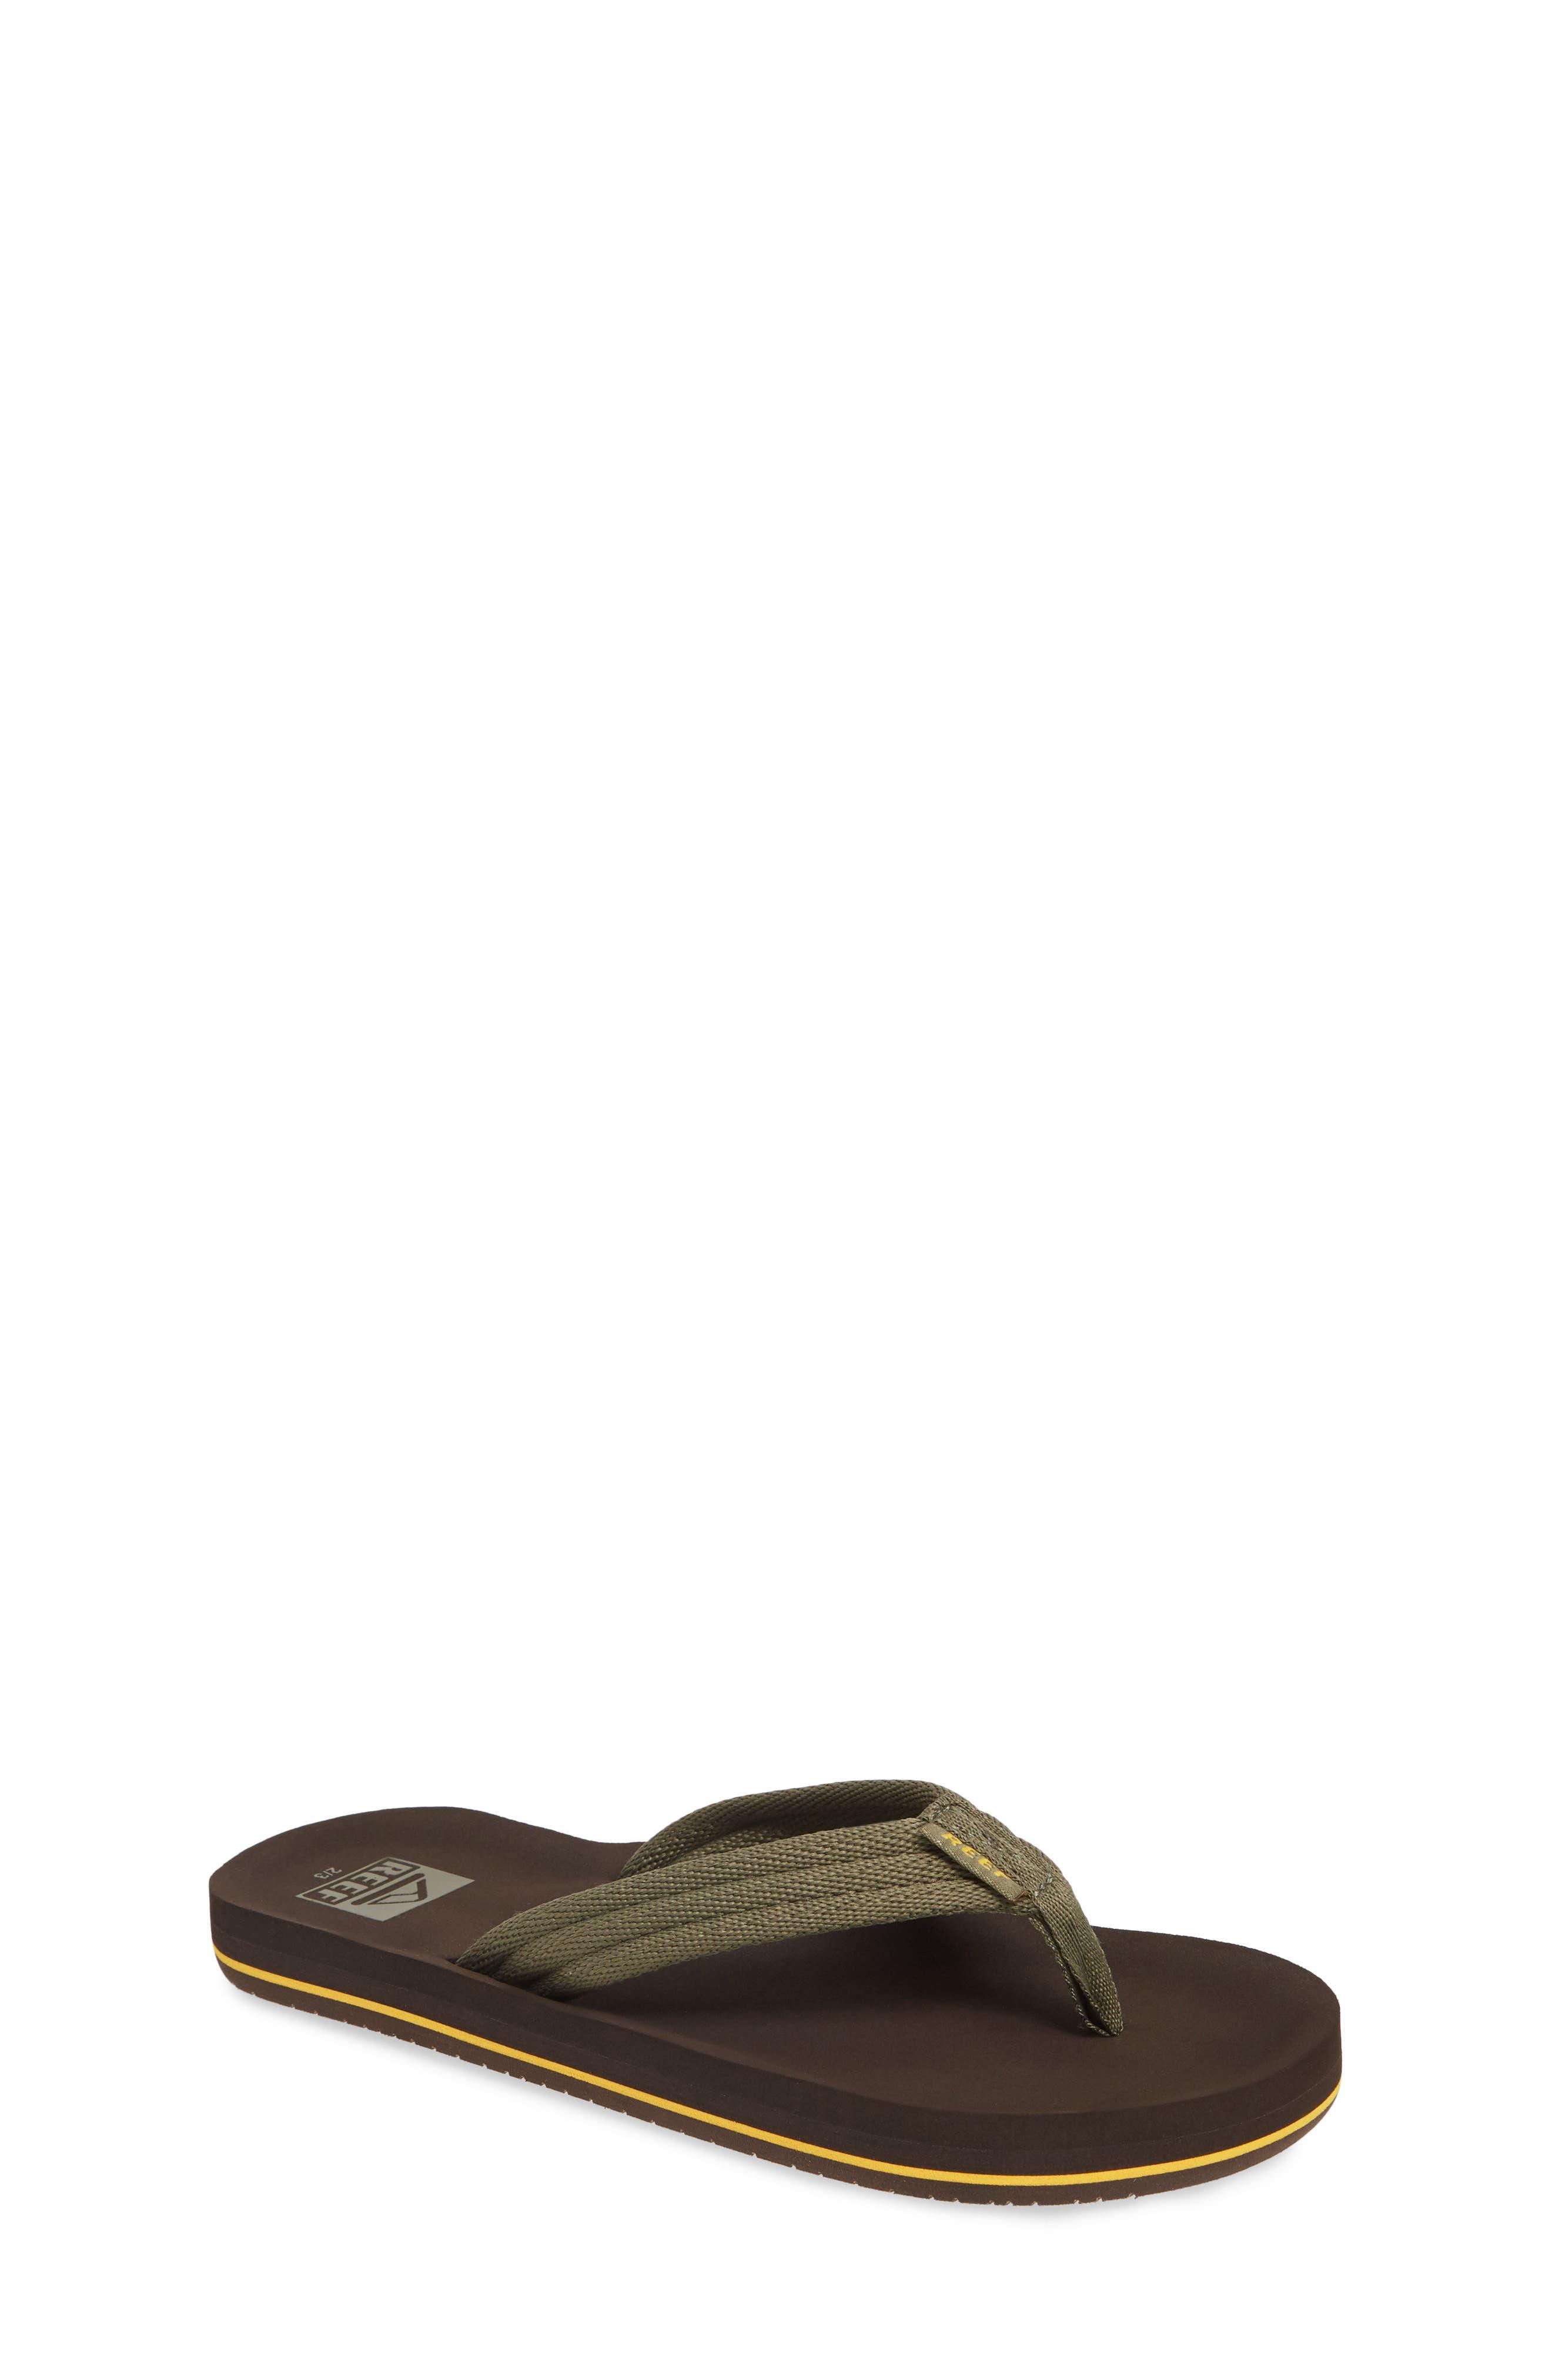 Ahi Beach Flip Flop, Main, color, BROWN/ OLIVE